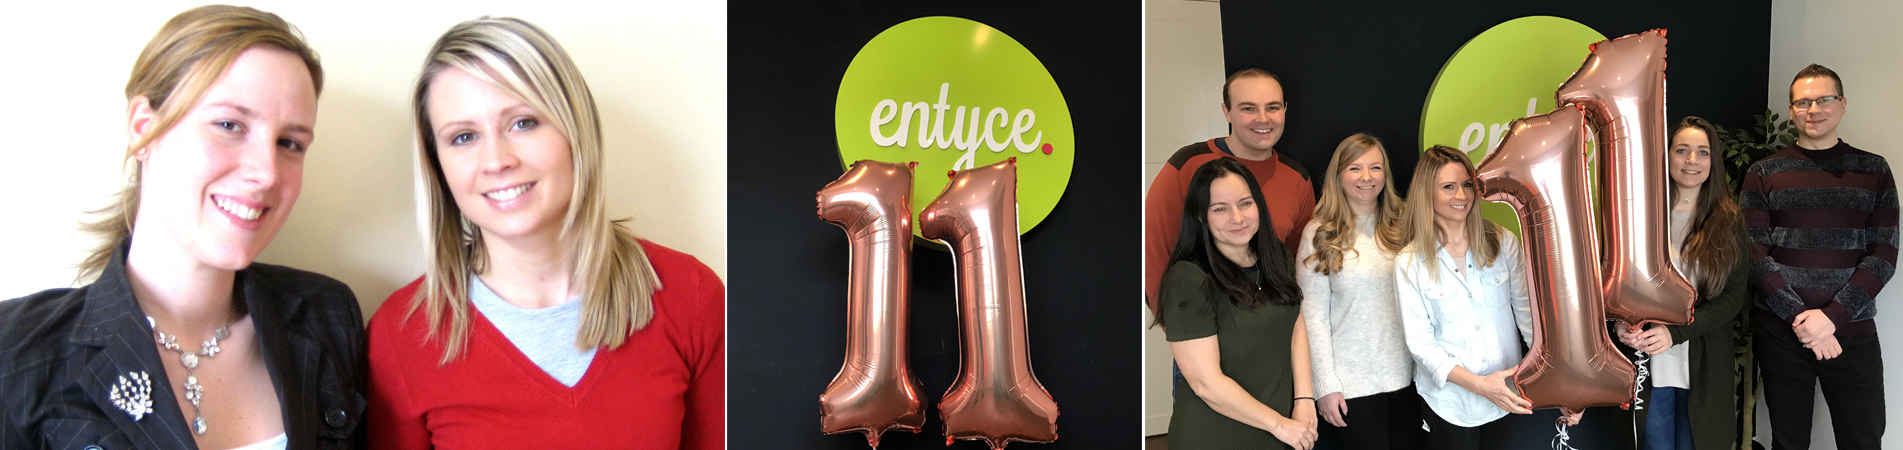 Entyce Creative turns 11